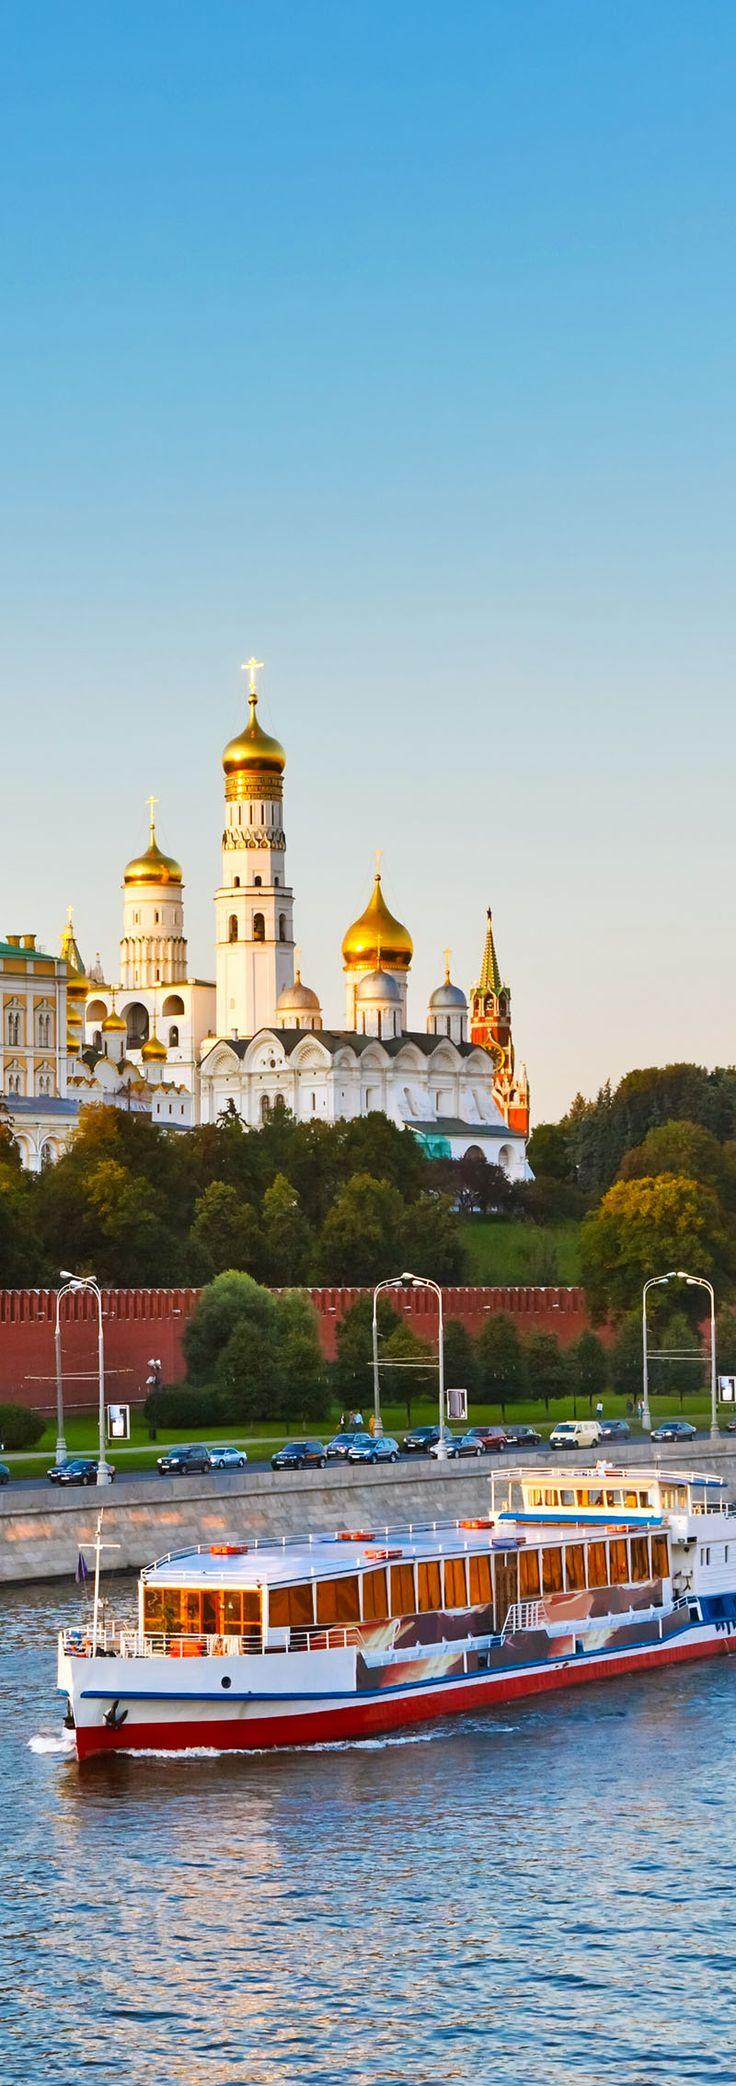 Famous Landmarks Around the World | USA Today